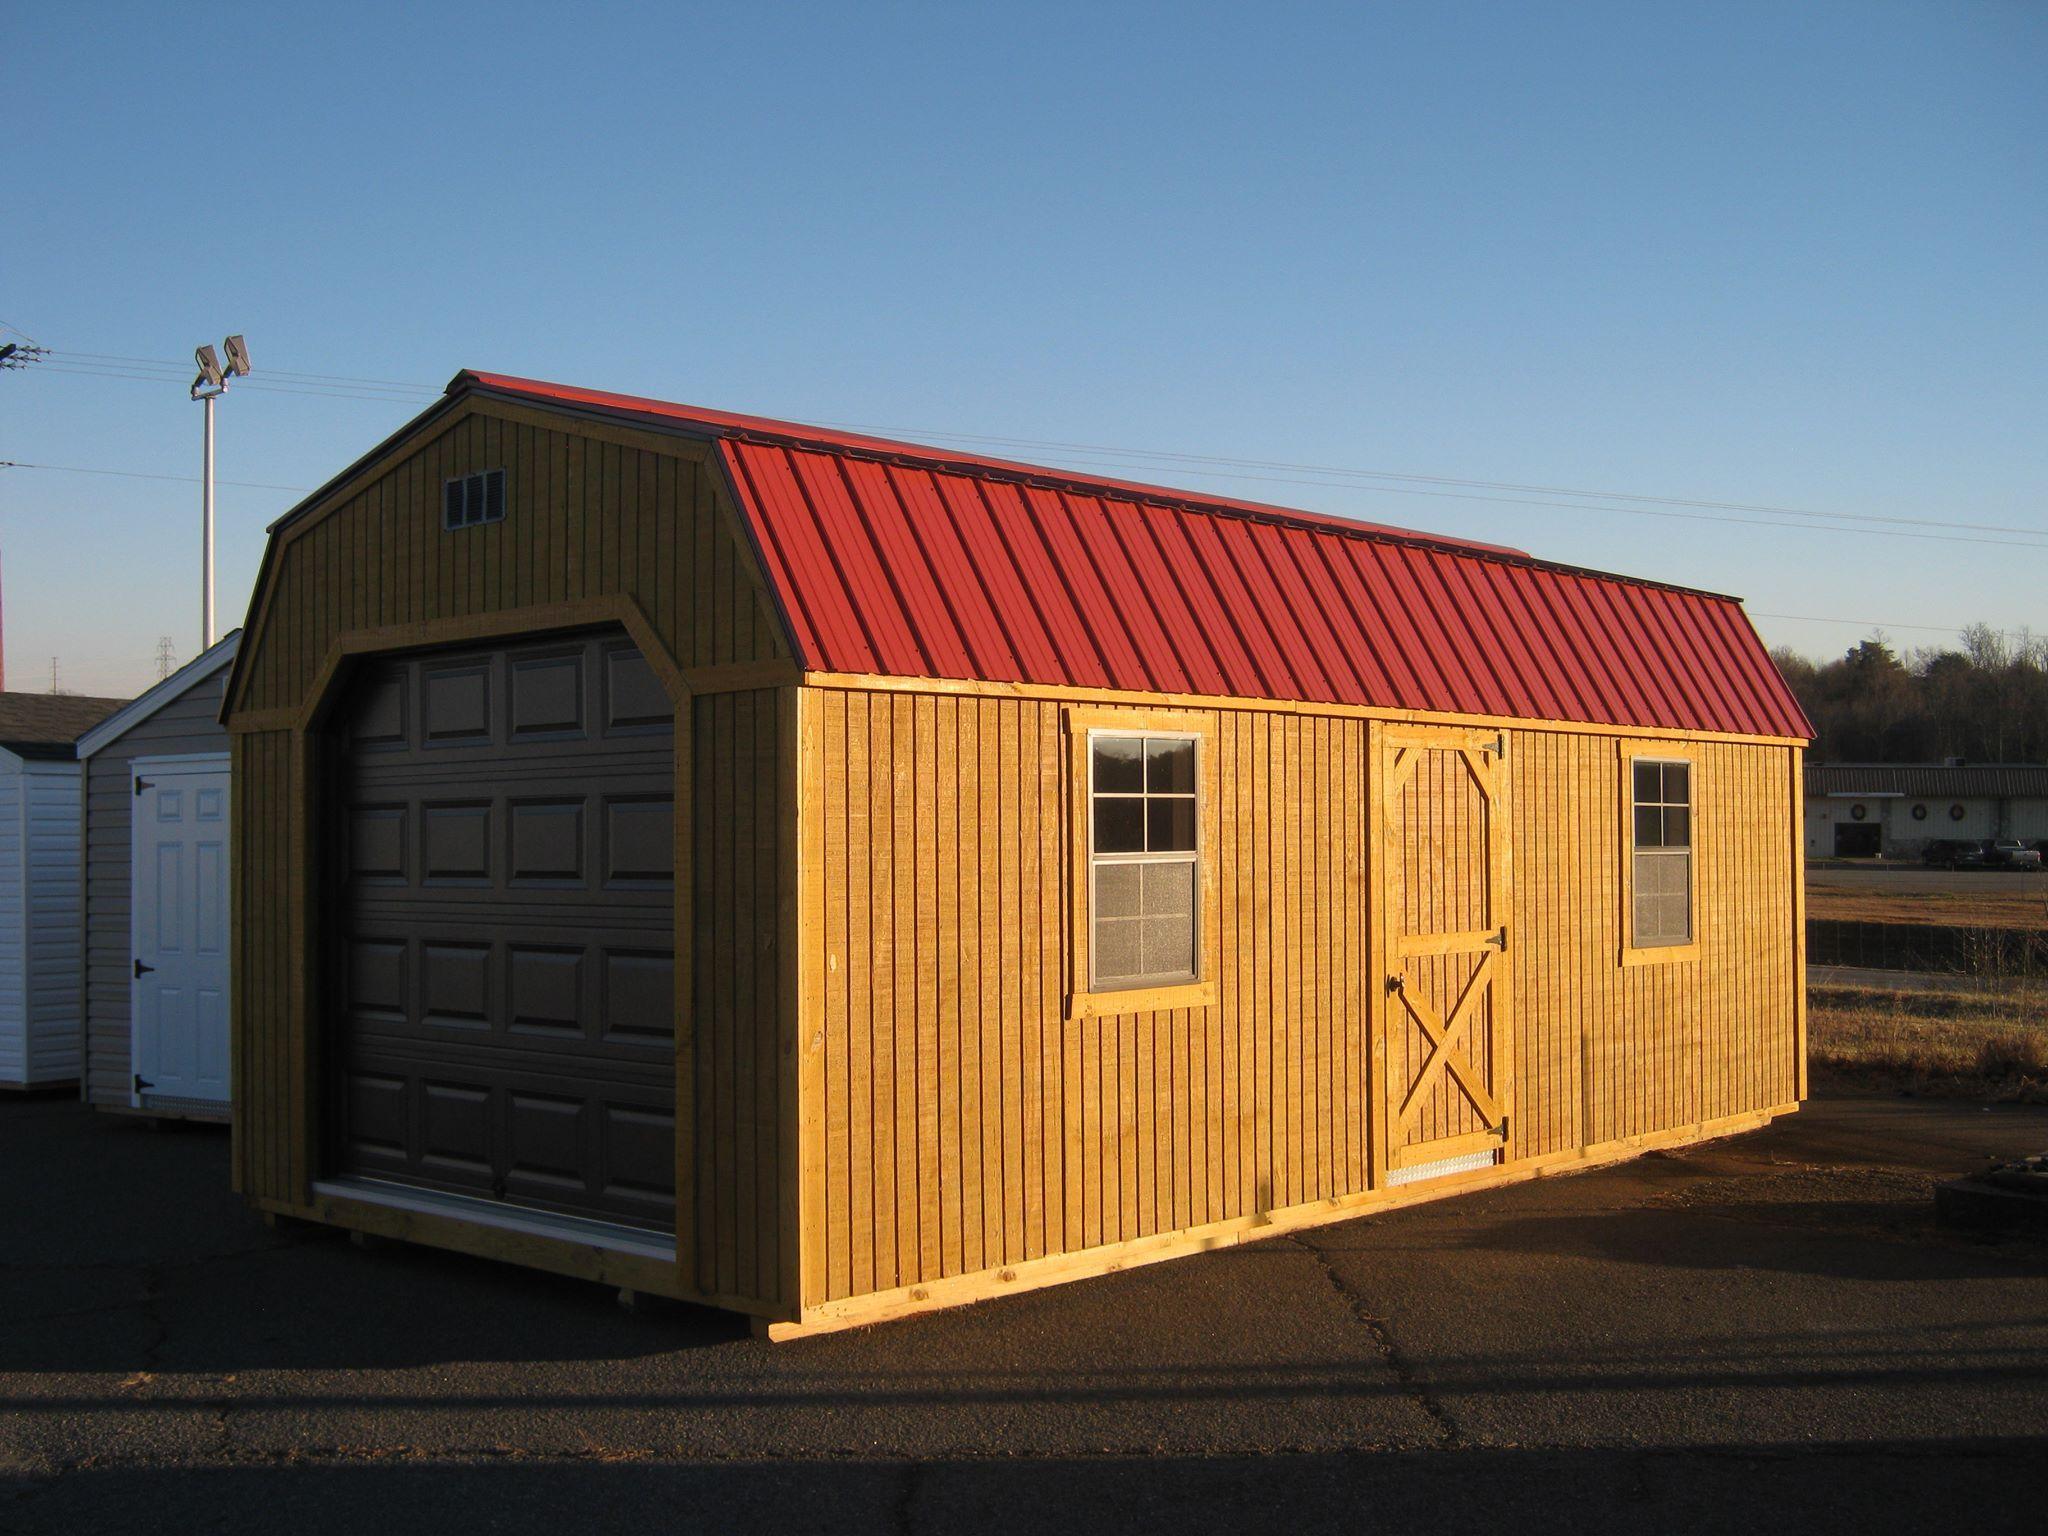 jersey gazebos new cape provider direct outdoor custom lancaster storage built econo sheds amish